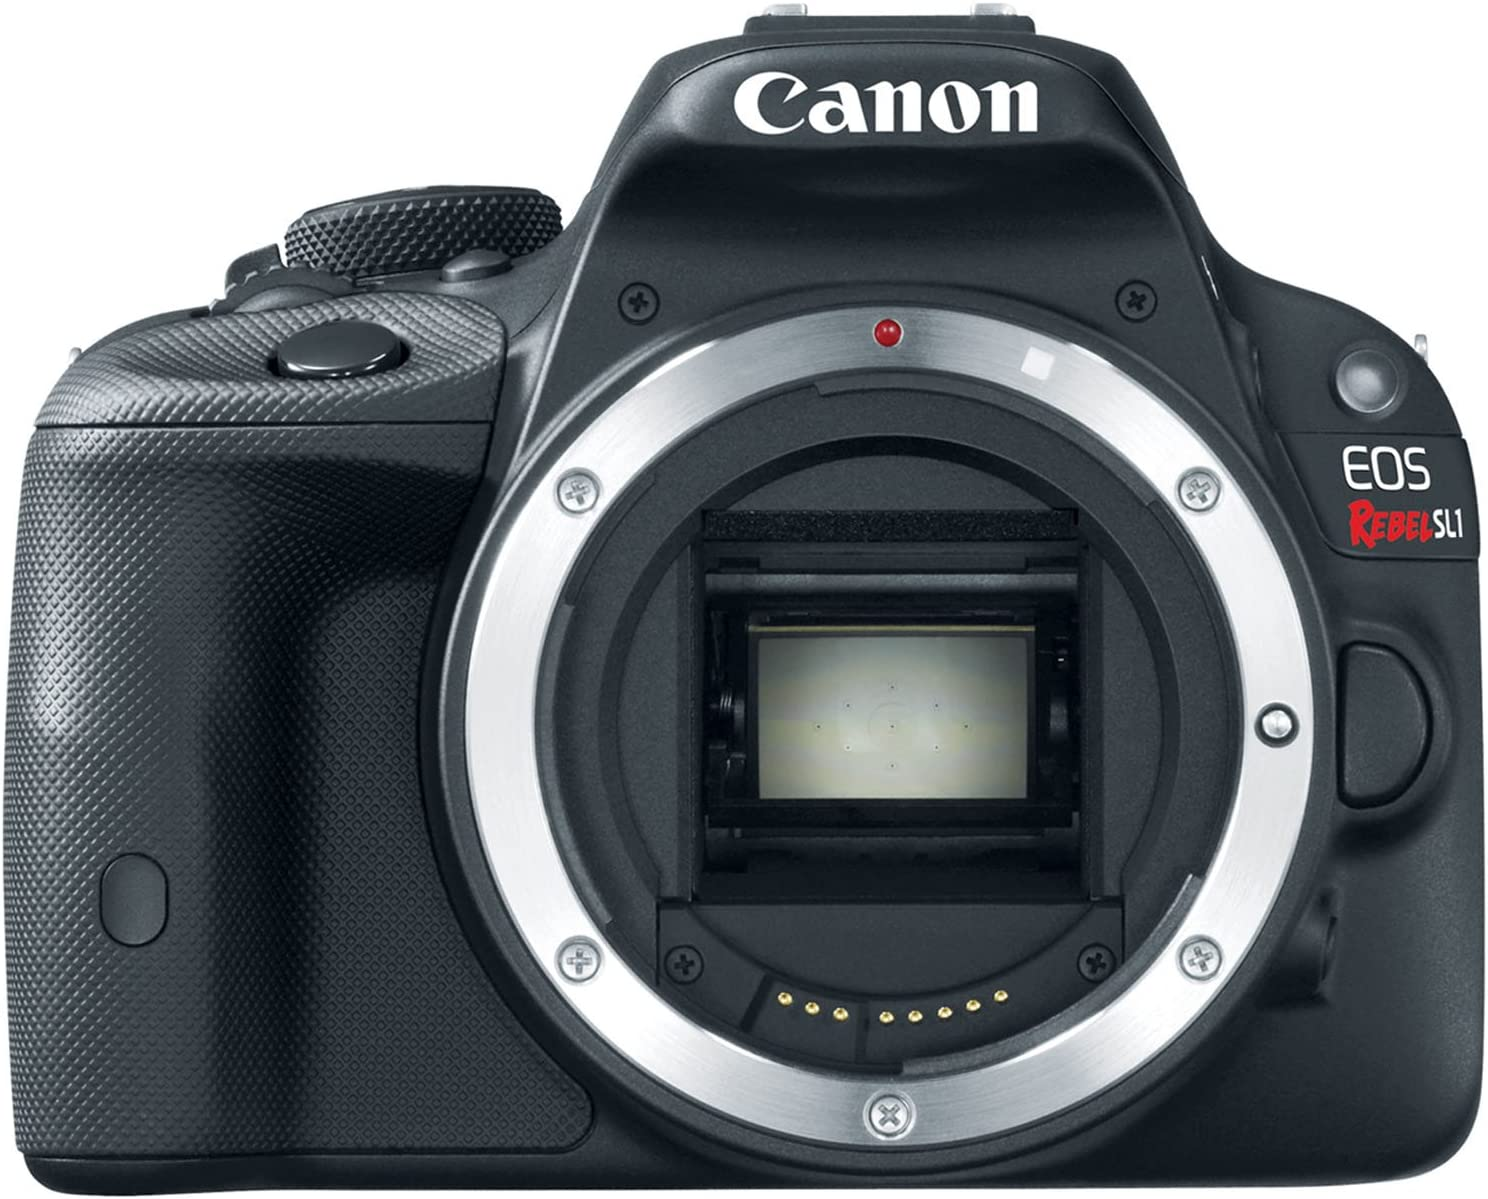 Canon Rebel SL1 Digital Camera Tripod Folding Table-Top Tripod for Compact Digital Cameras and Camcorders Approx 5 H